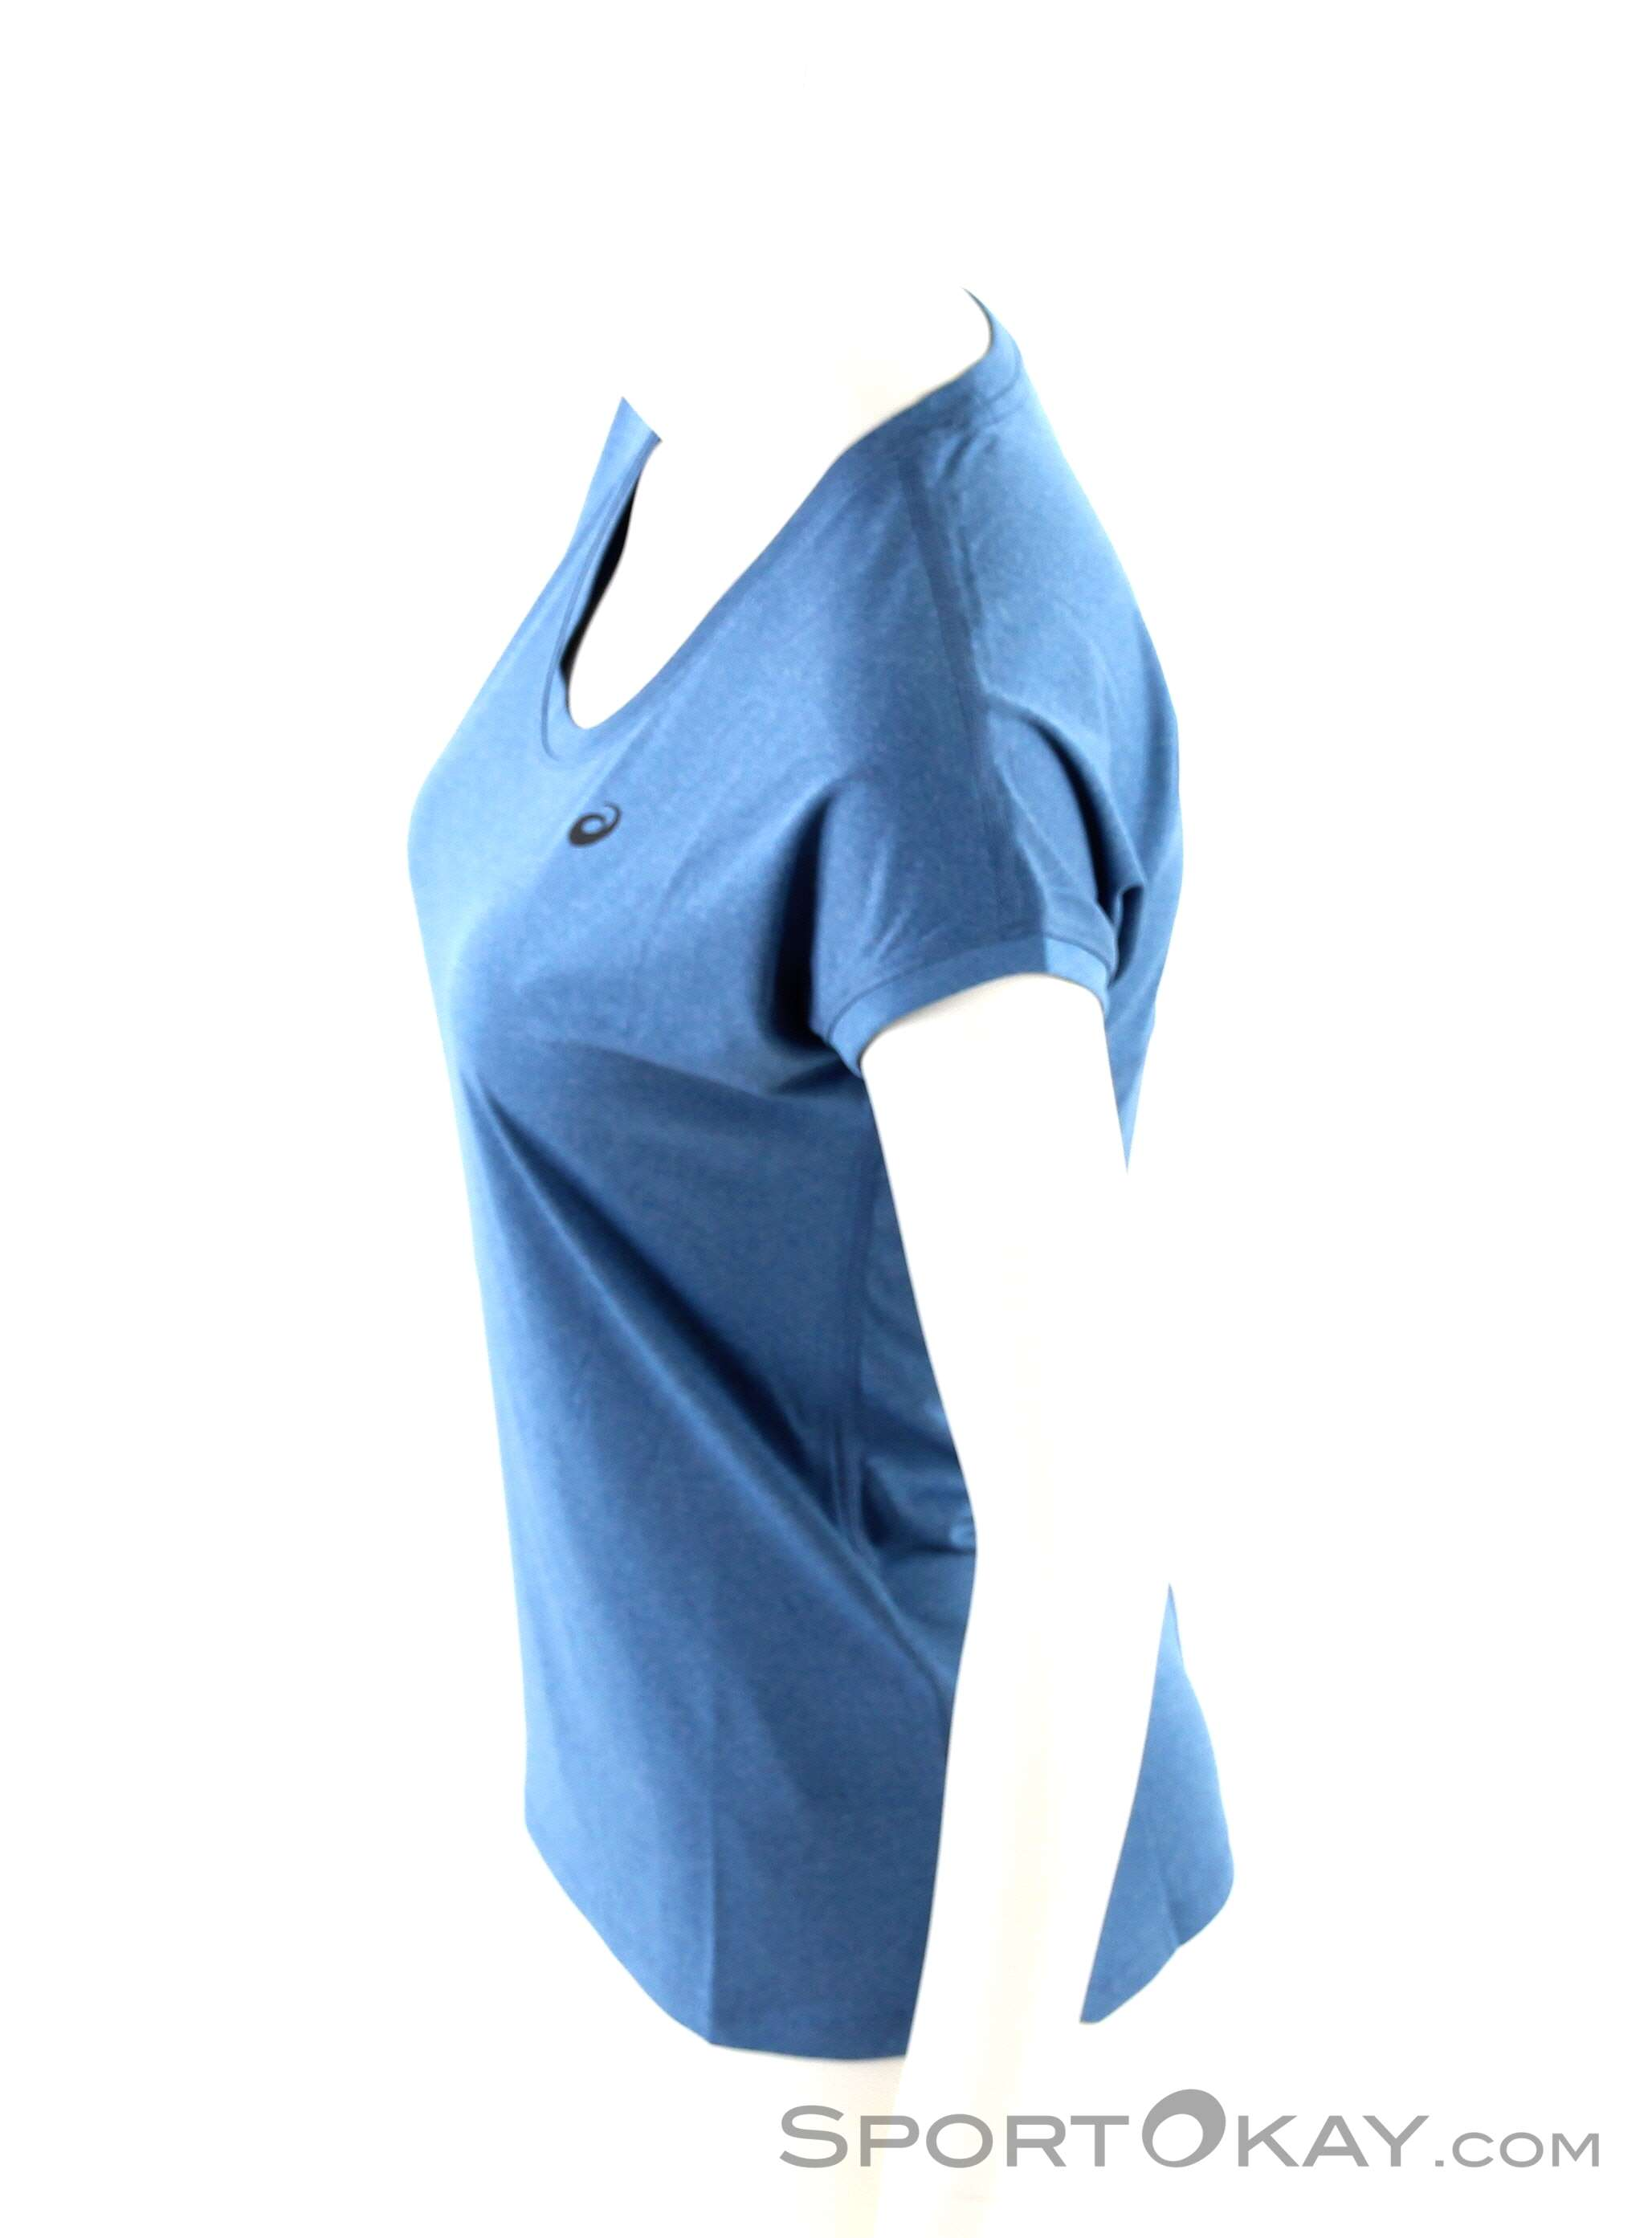 Maglieta Magliette Donna amp; Asics T Top Shirt Capsleeve PxgfvqH